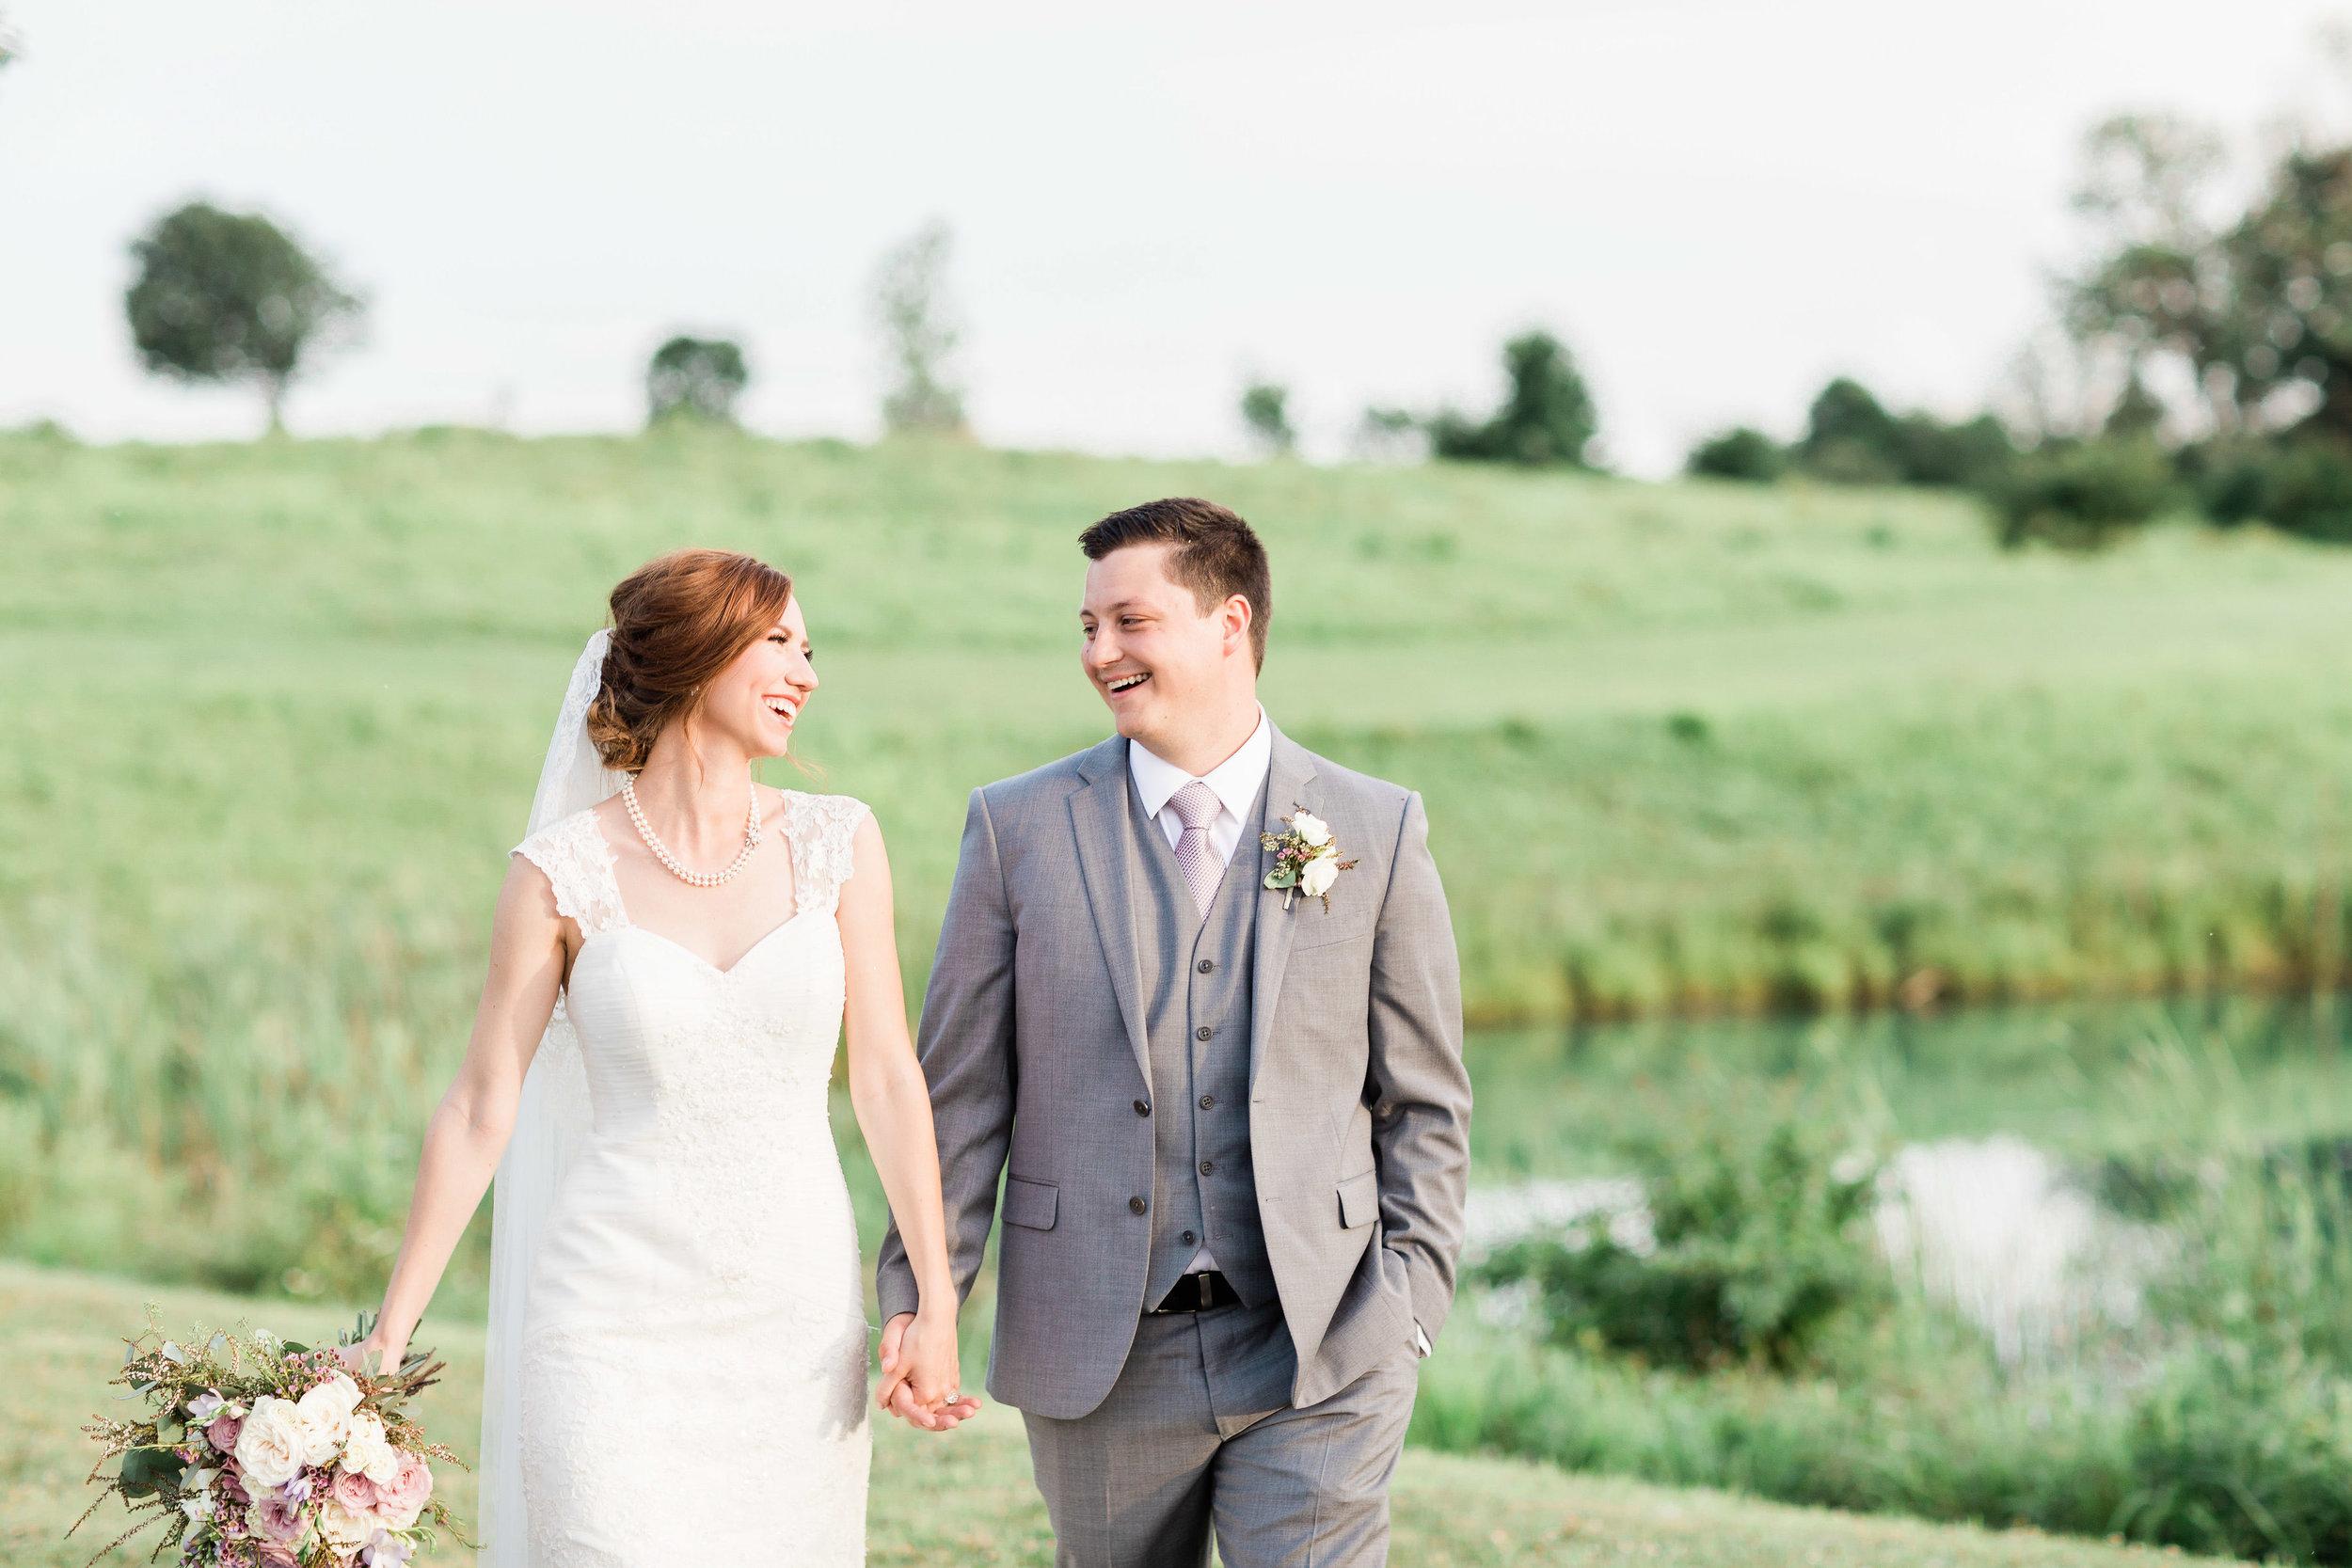 lauren day photography cincinnati wedding photographers -6.jpg